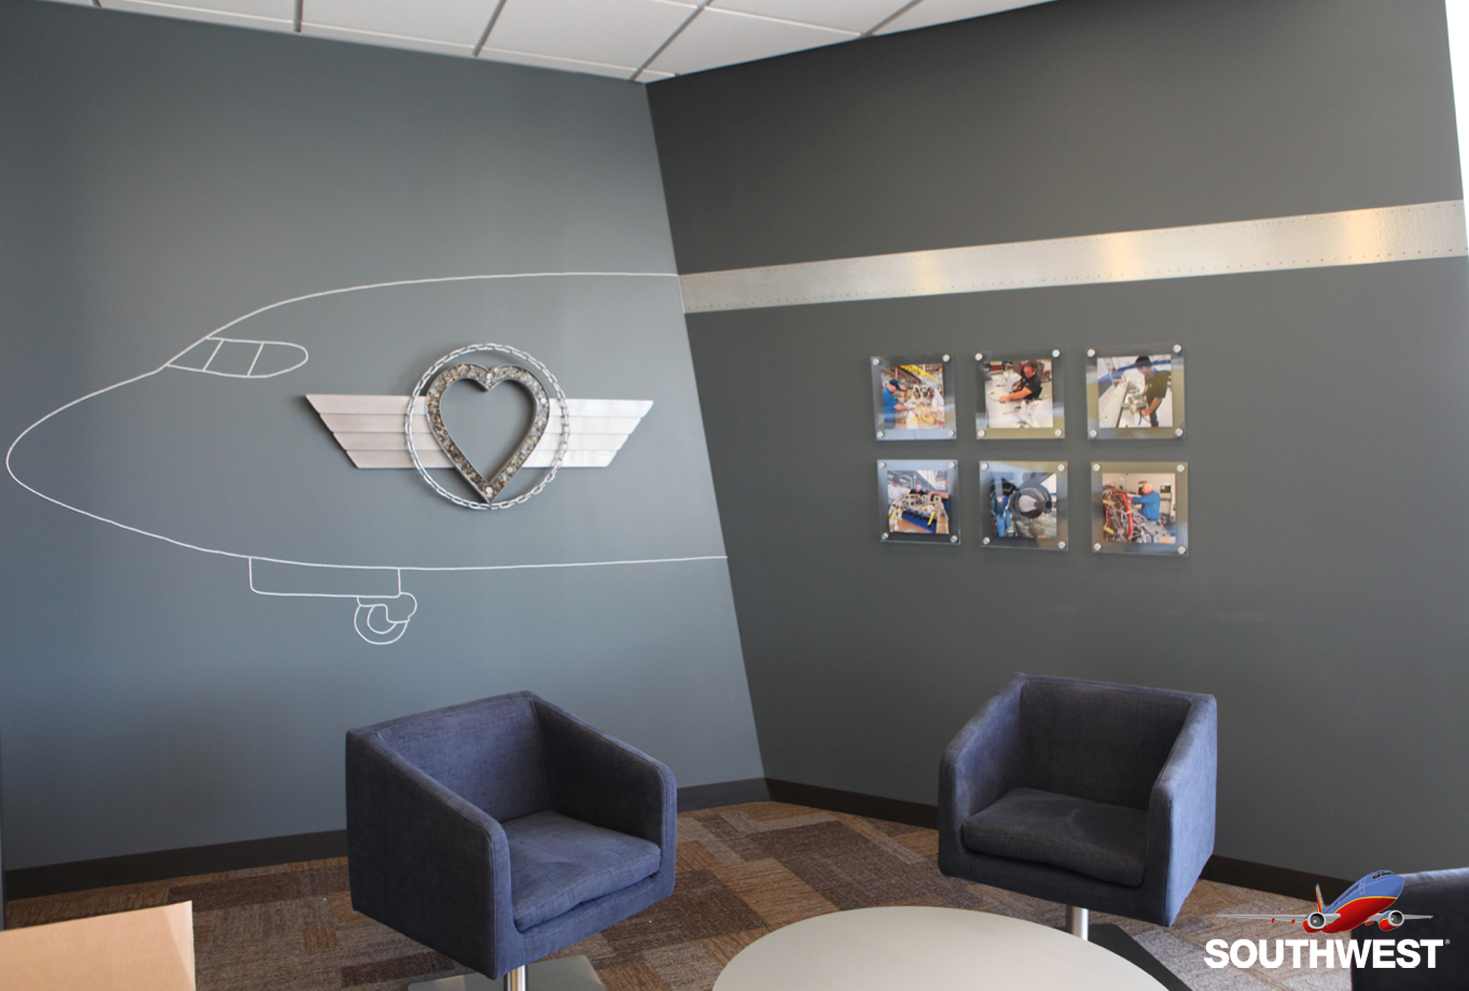 Southwest Airlines Corporate Design